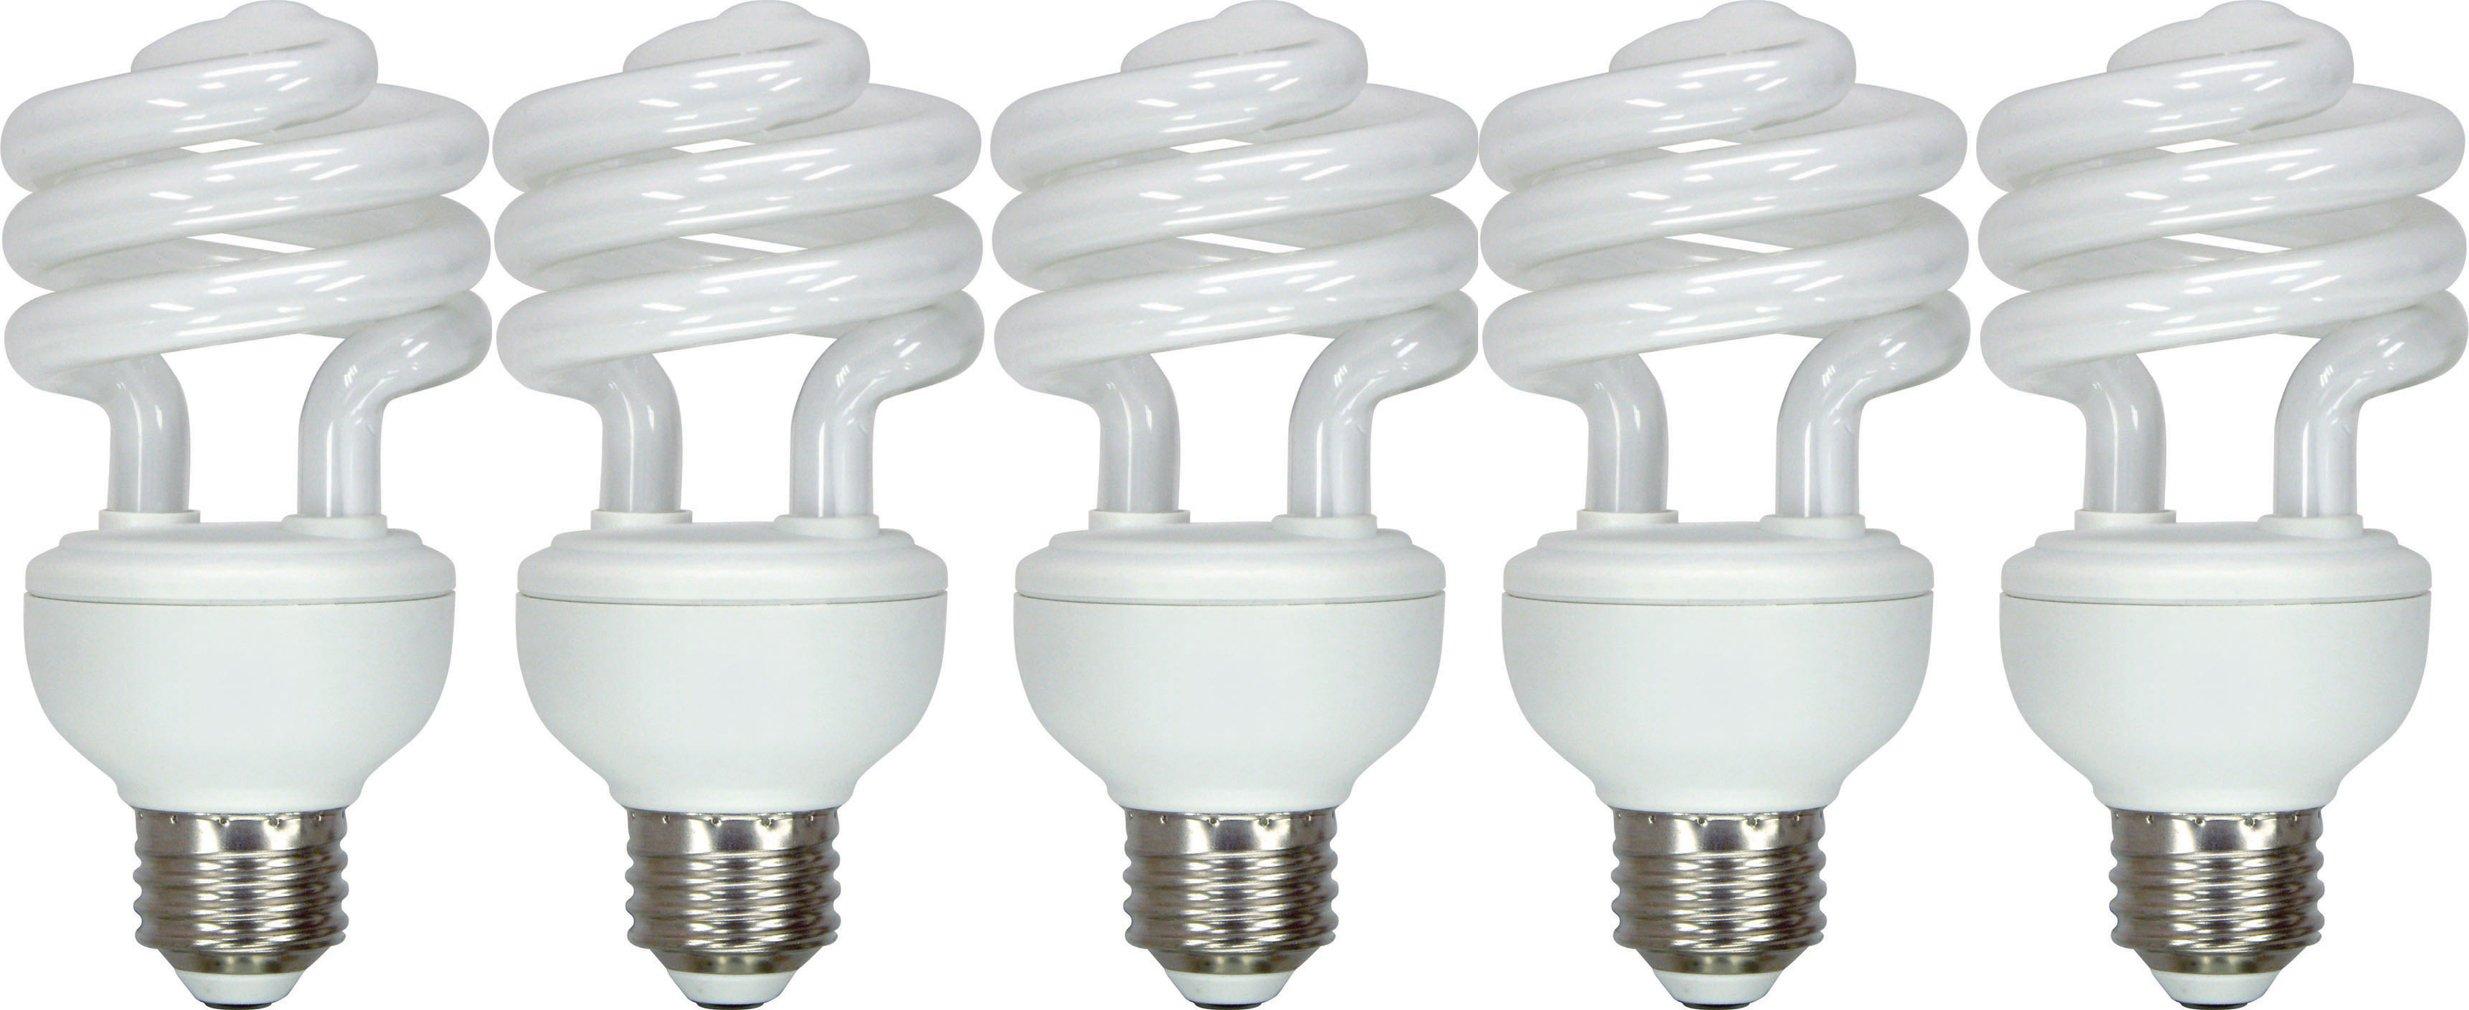 GE Lighting 97249 20-Watt 1250-Lumen General Purpose T3 Spiral CFL Bulb, Soft White, 5-Pack